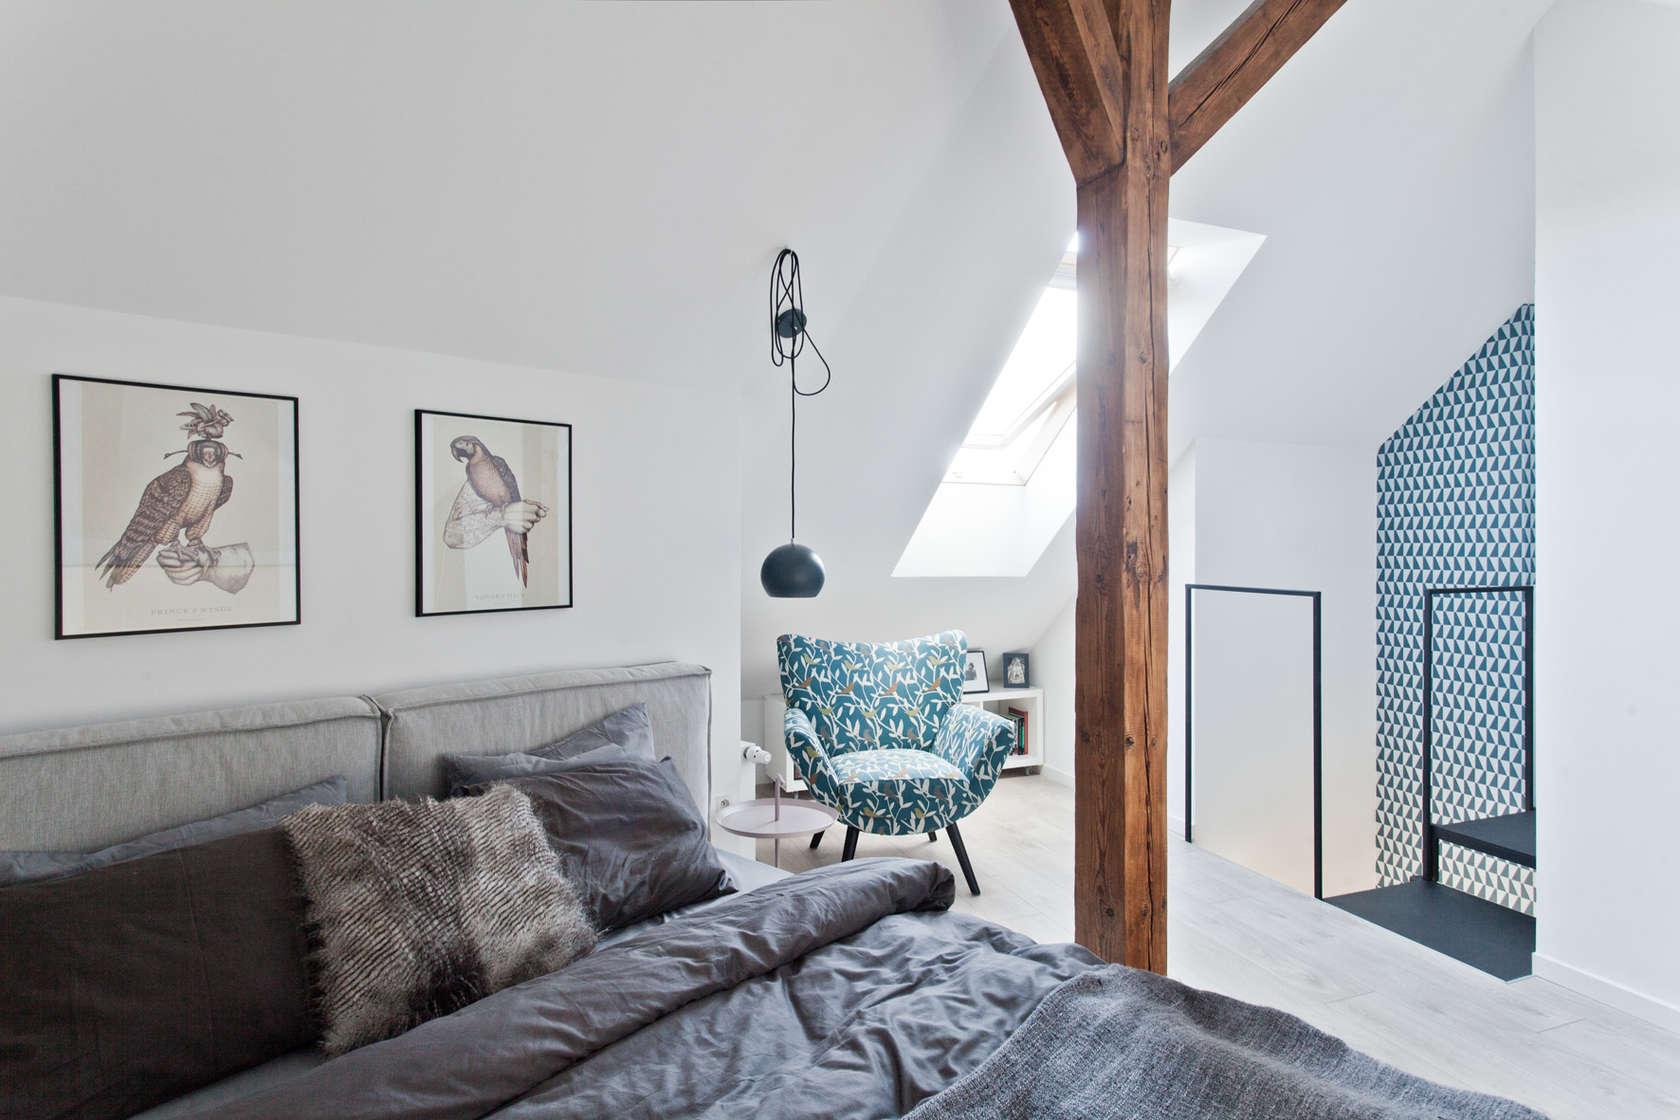 Da soffitta a mansarda una splendida trasformazione - Cuadros para decorar habitaciones ...